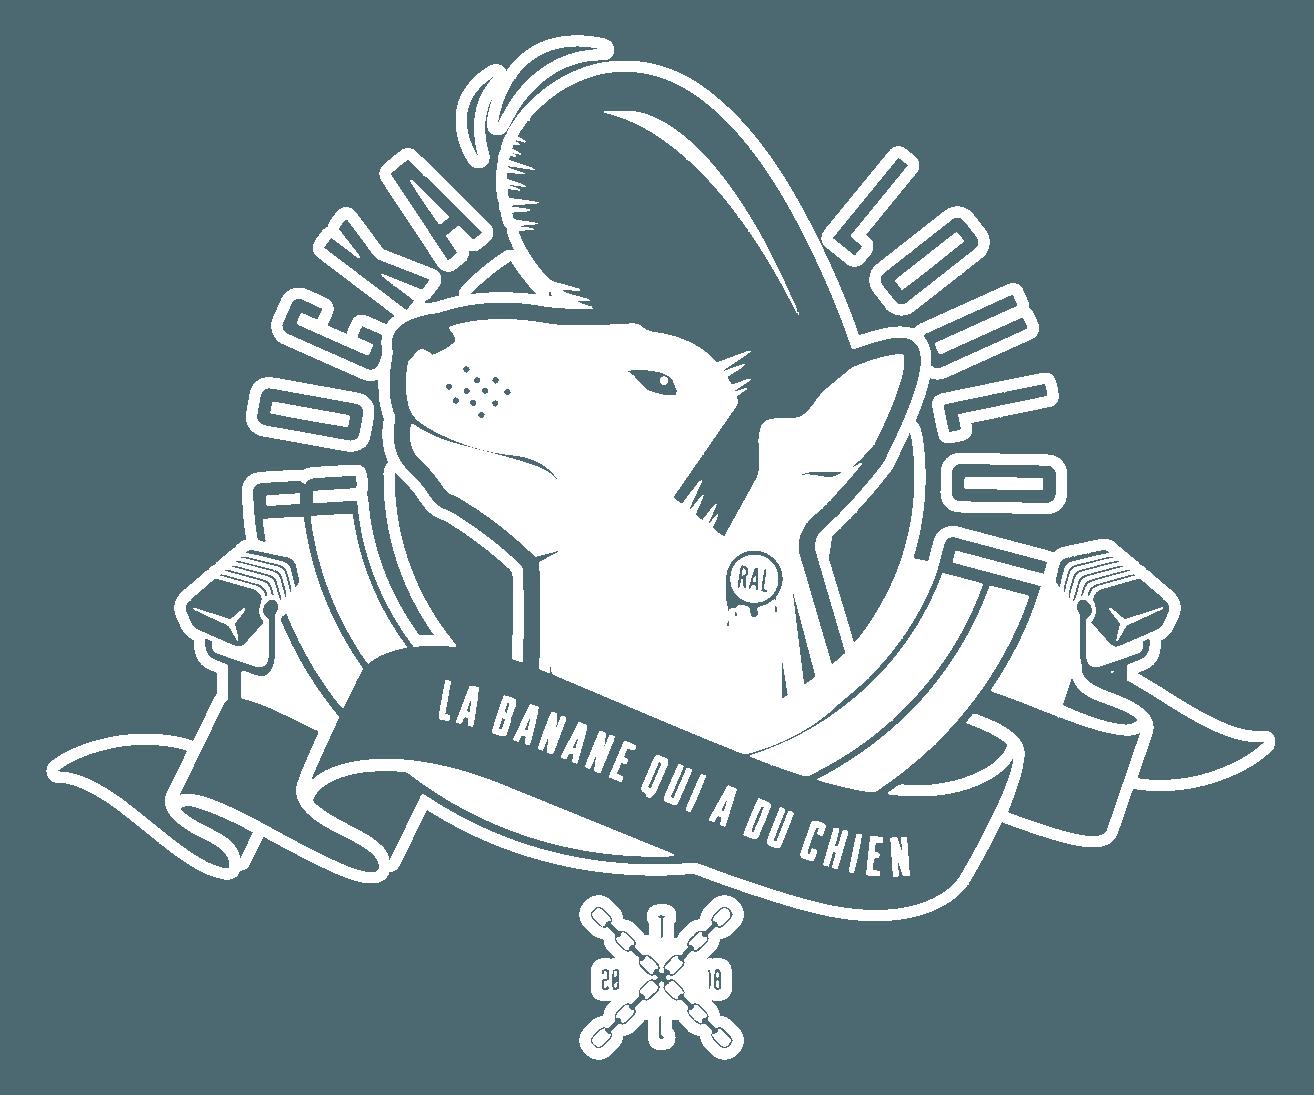 Logo Rockaloulou, marque de vêtements rockabilly